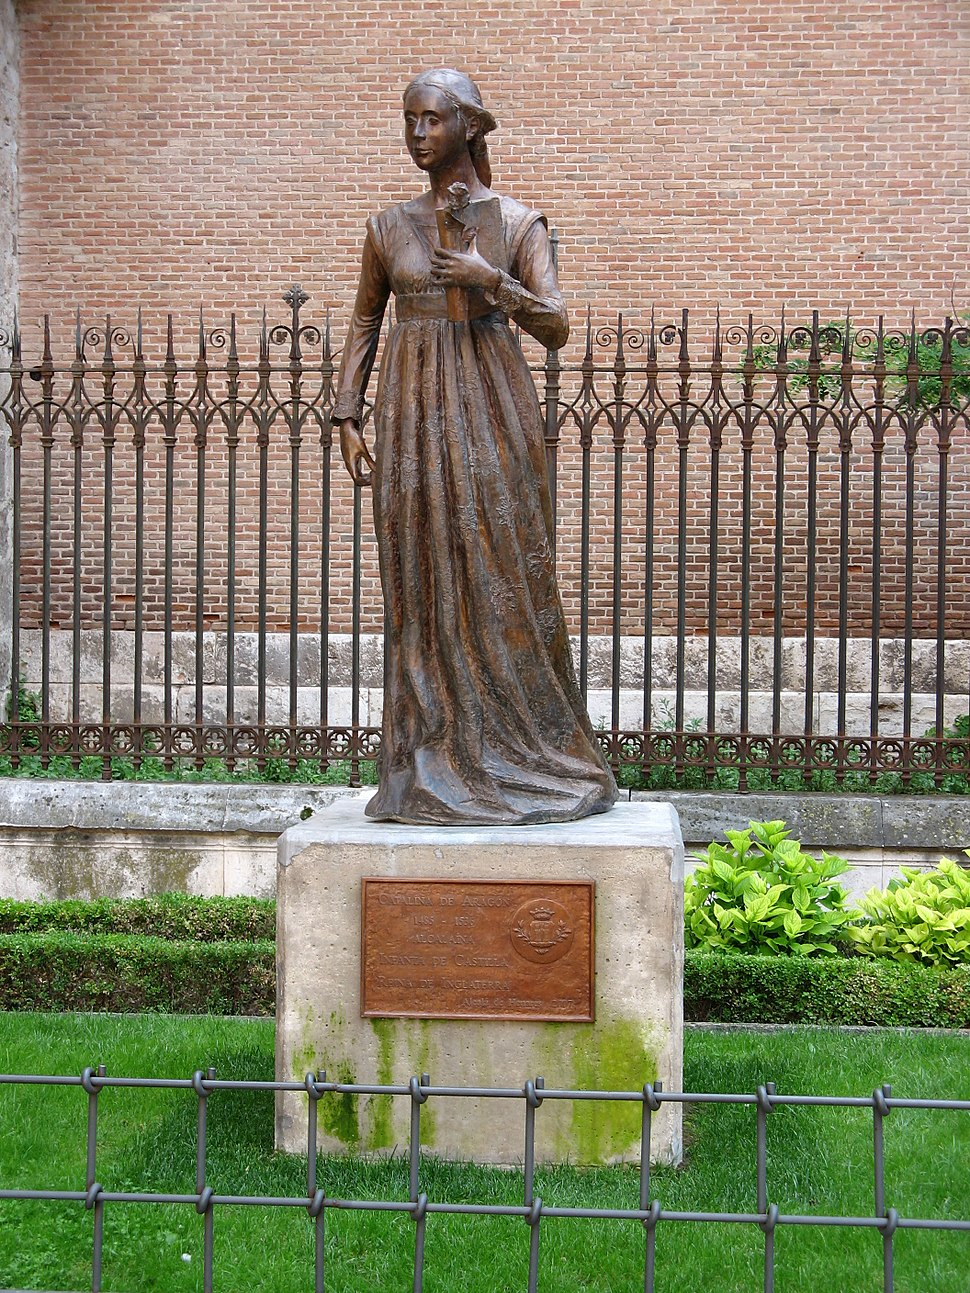 Alcalá de Henares, Monumento a Catalina de Aragón (M. Peinado 24-05-2008)